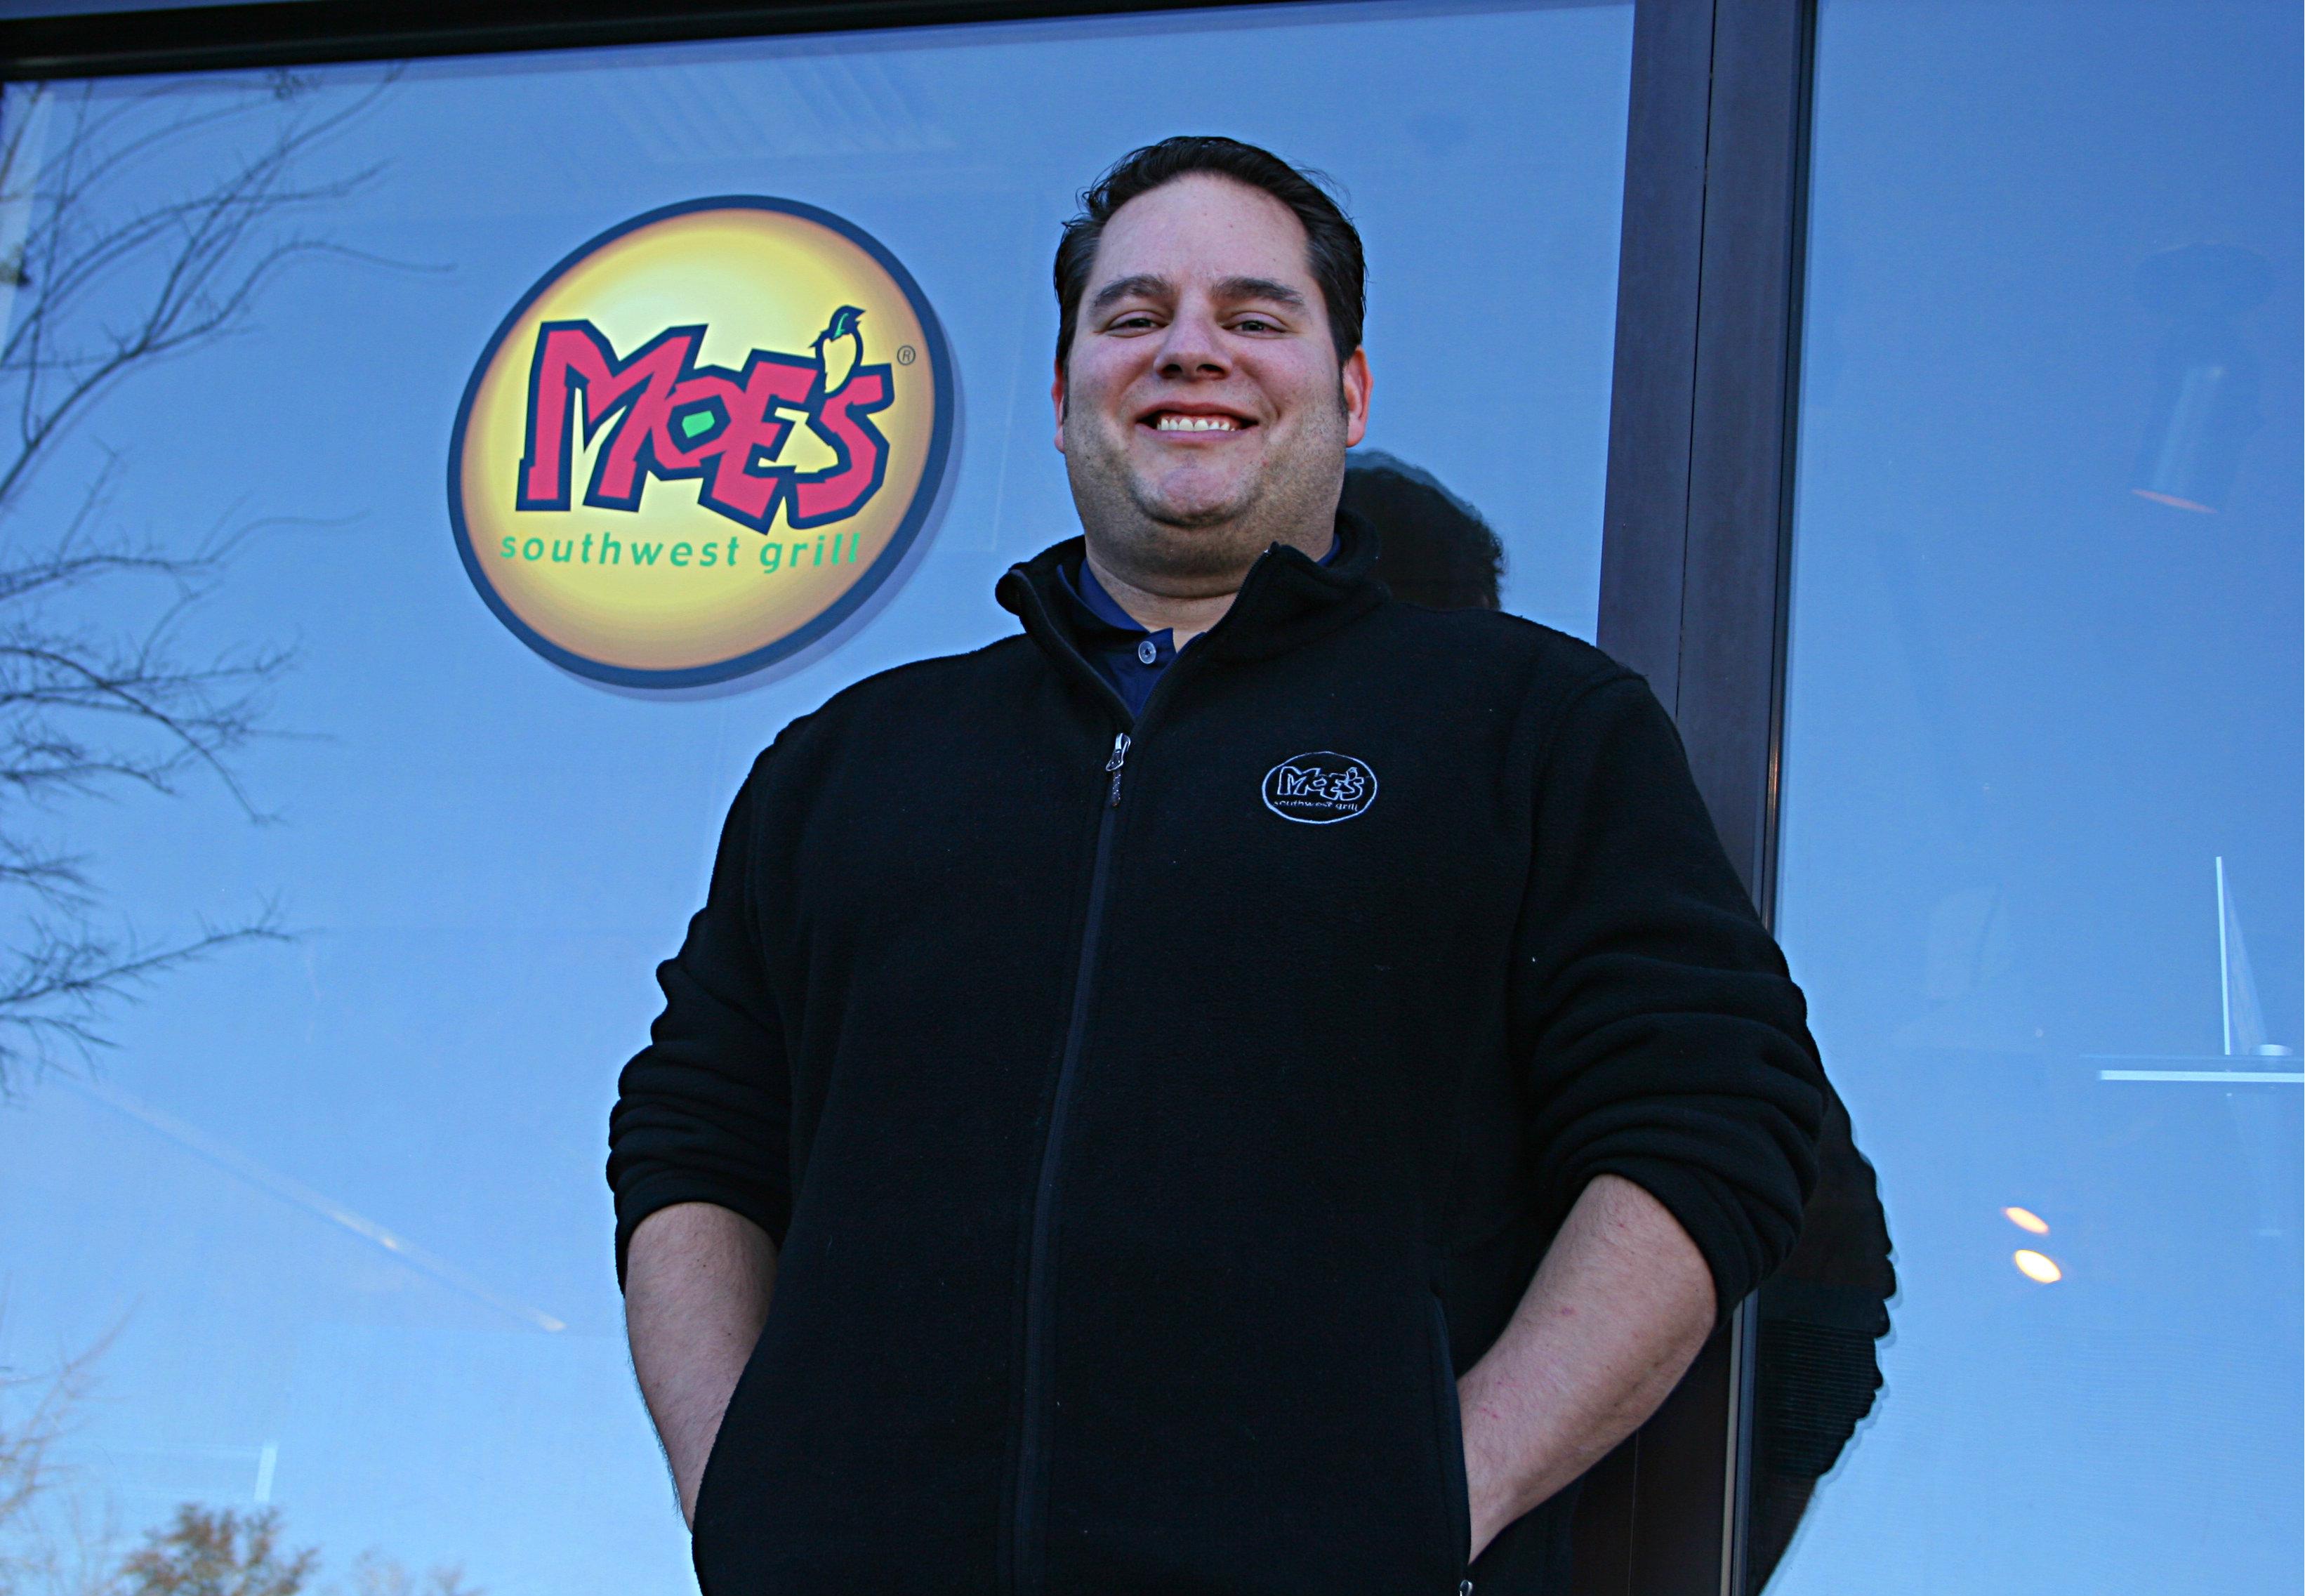 Meet a Local:  Meet Jeff Feus, owner of Moe's Southwest Grill